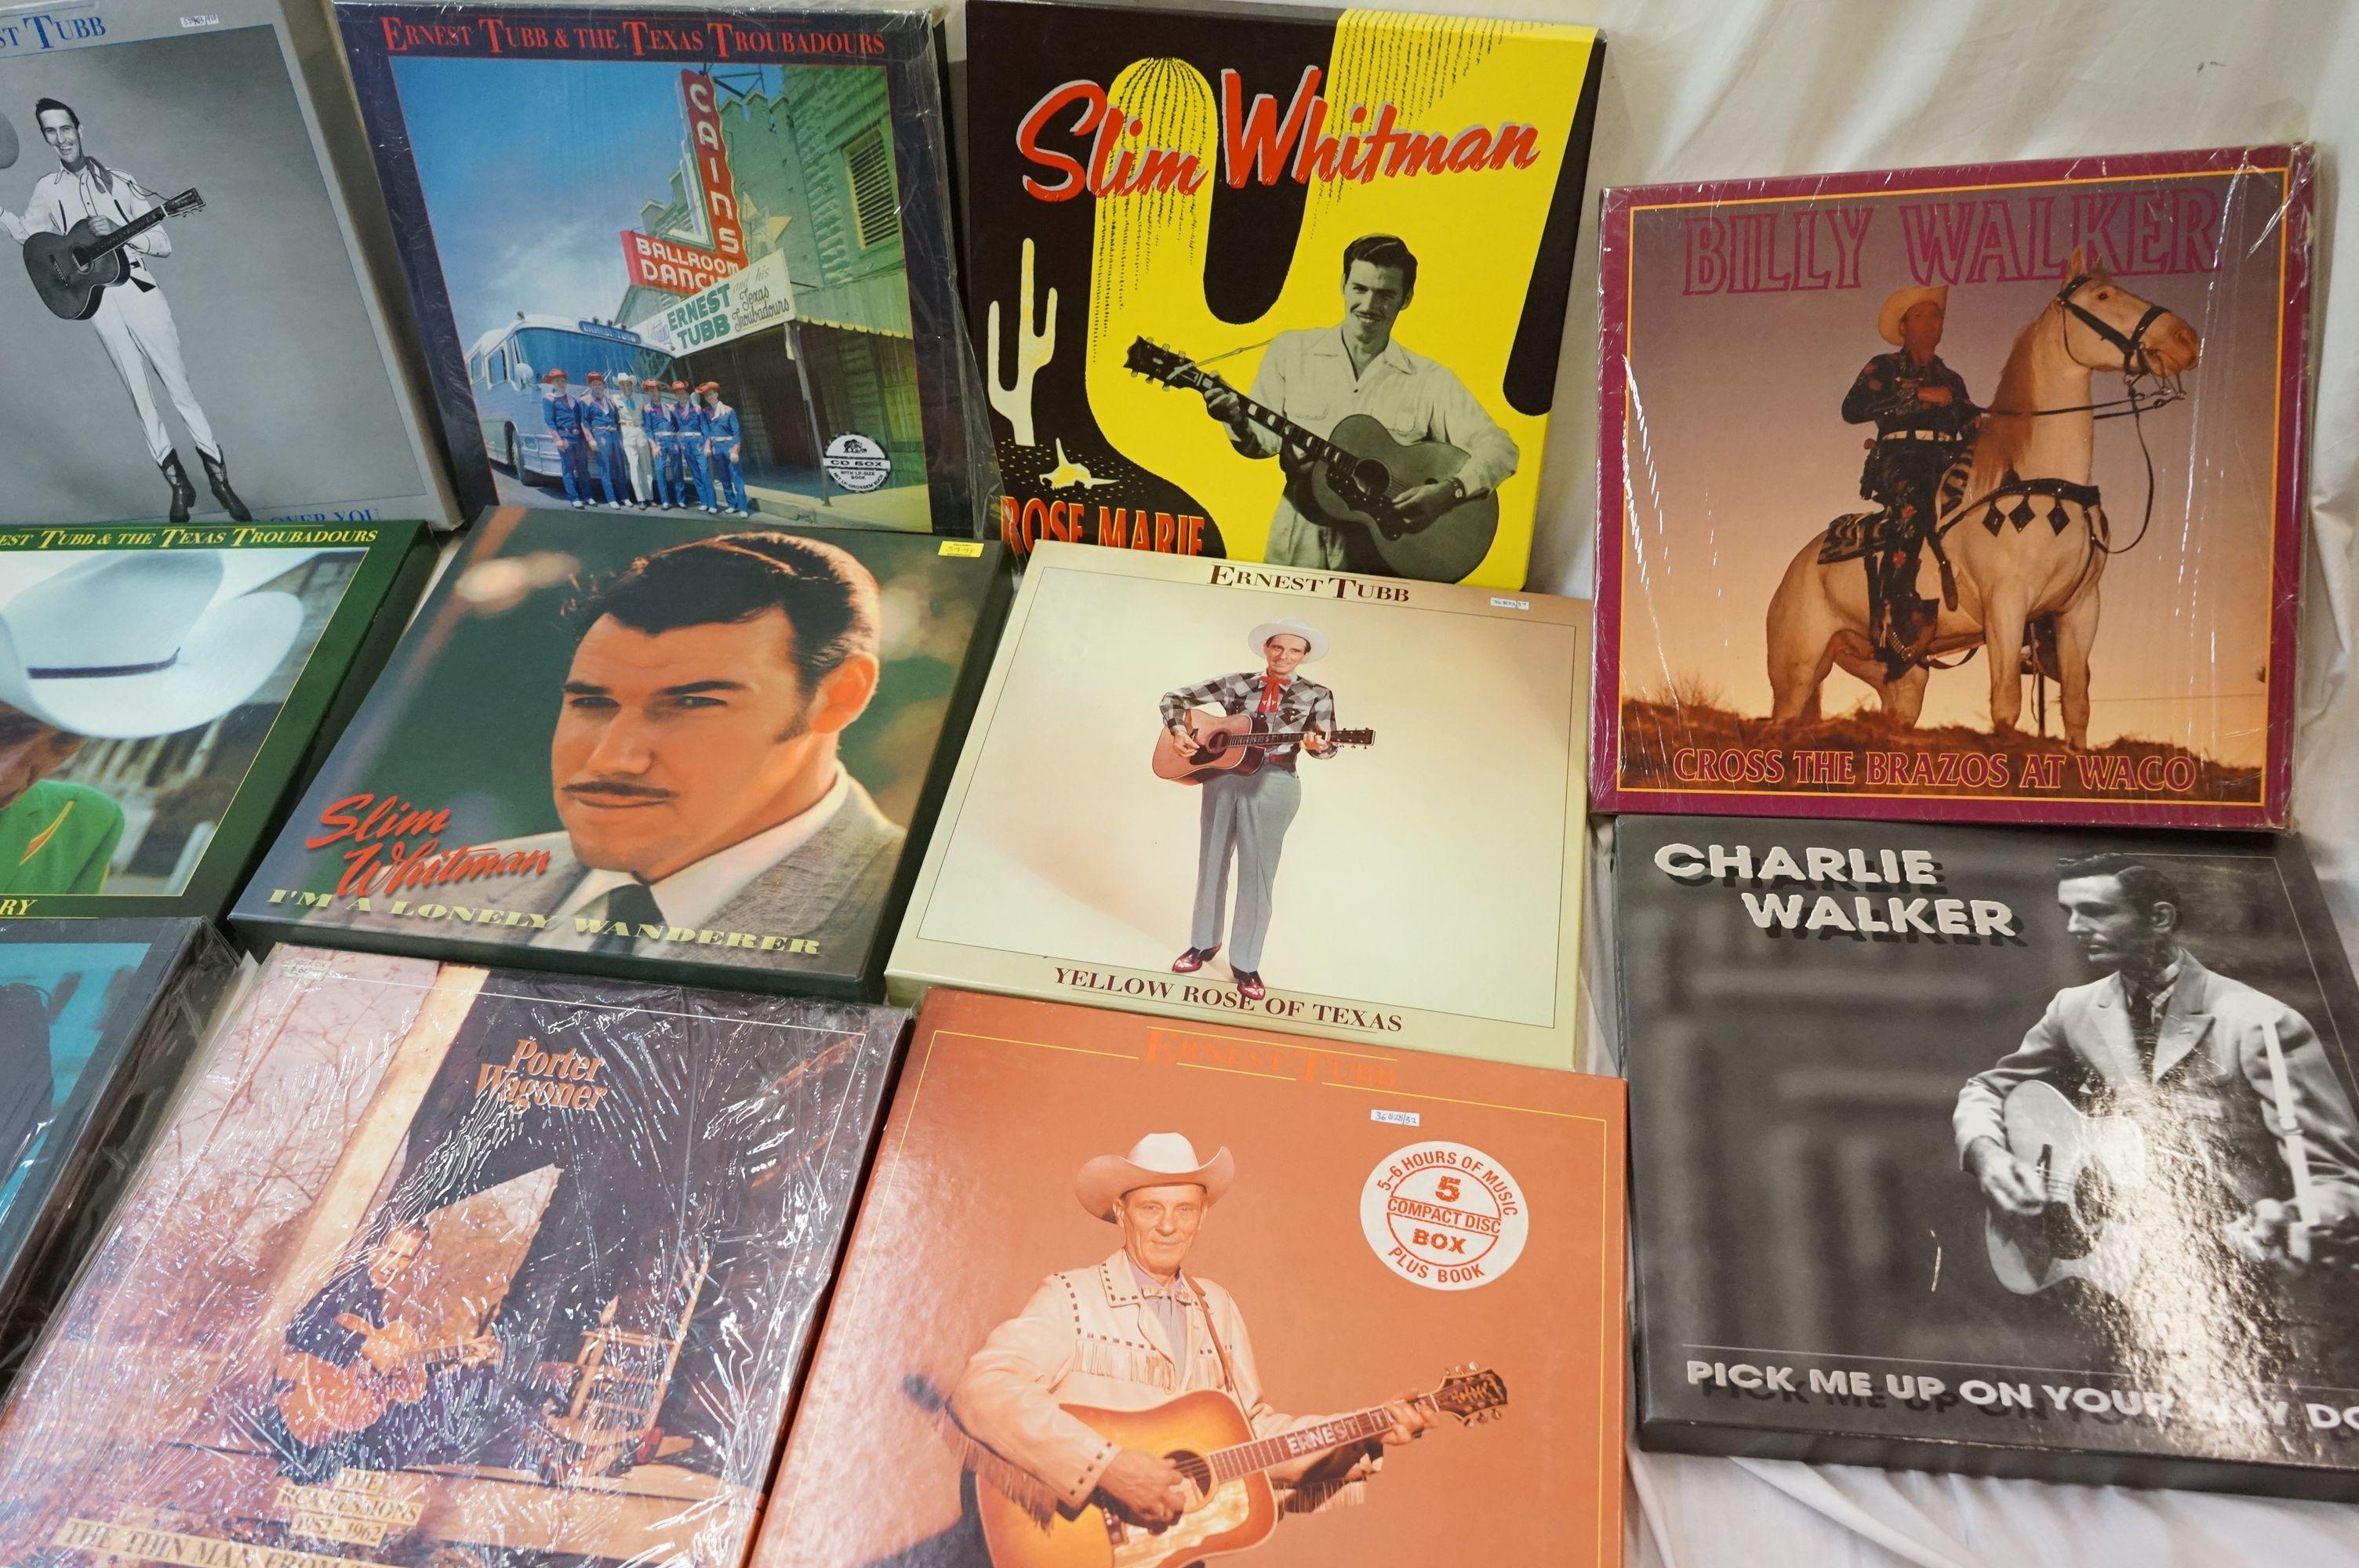 Vinyl - Around 130 LPs and 14 Box Sets to include Charlie Wiseman, Mac Wiseman, Slim Whitman etc ( - Image 4 of 5